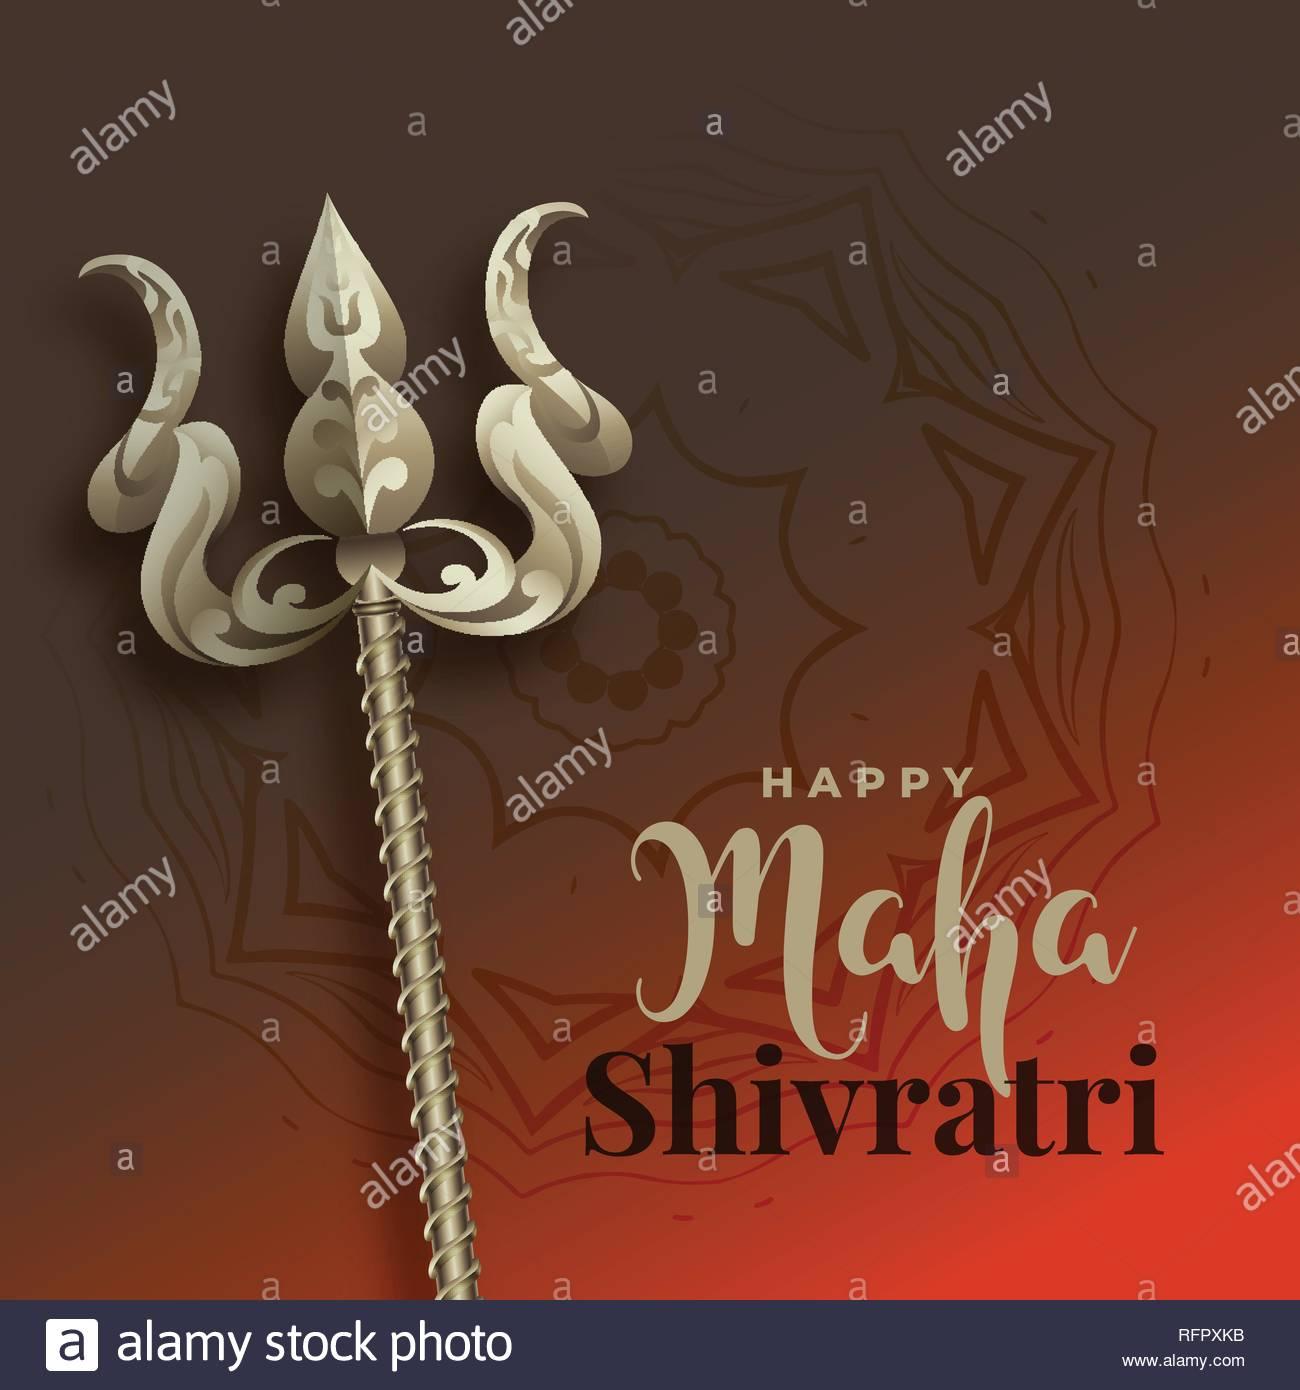 Maha Shivratri Stock Photos & Maha Shivratri Stock Images